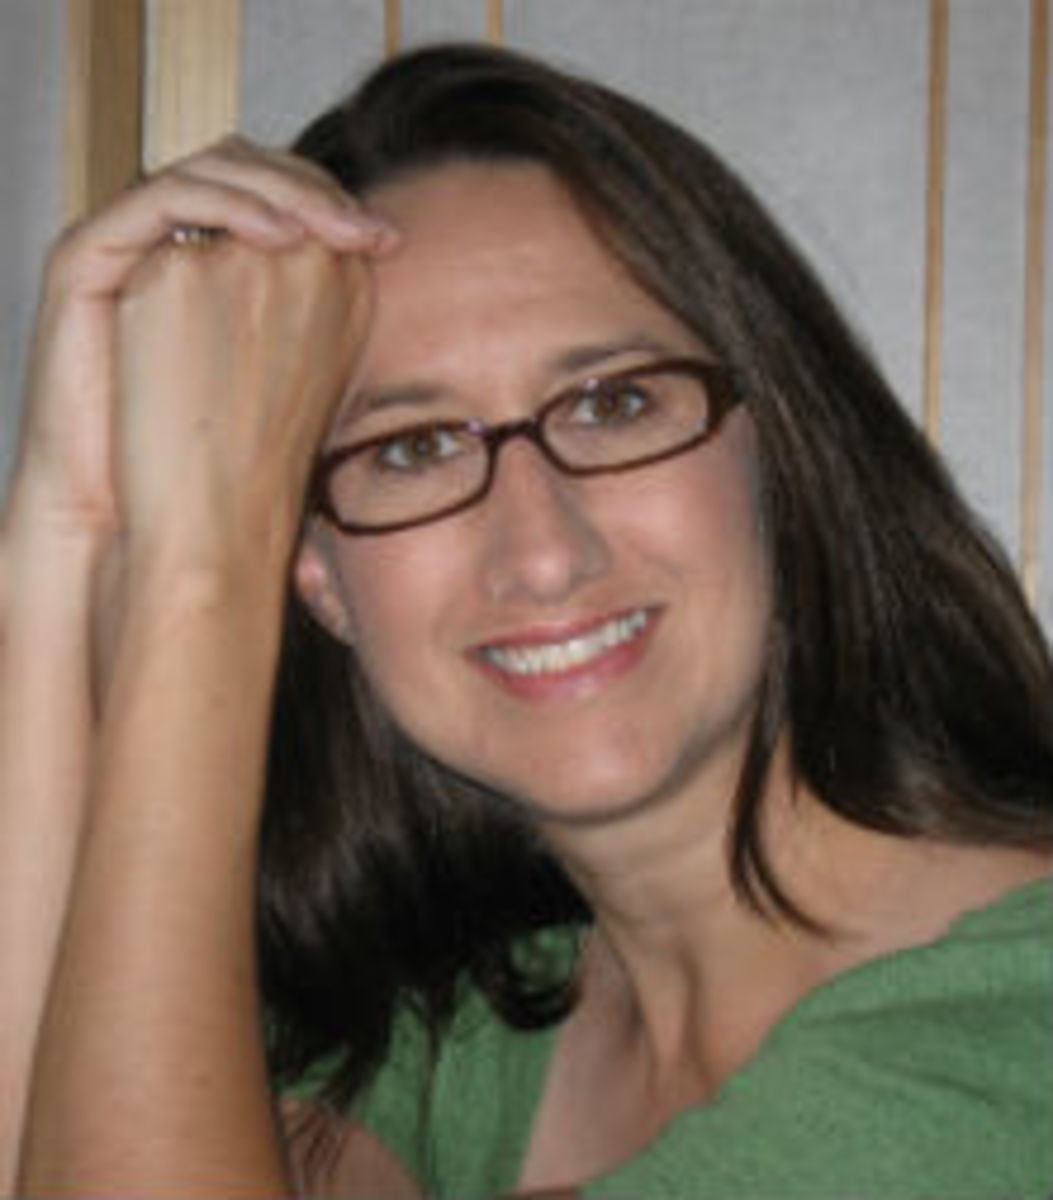 Jessica McCann